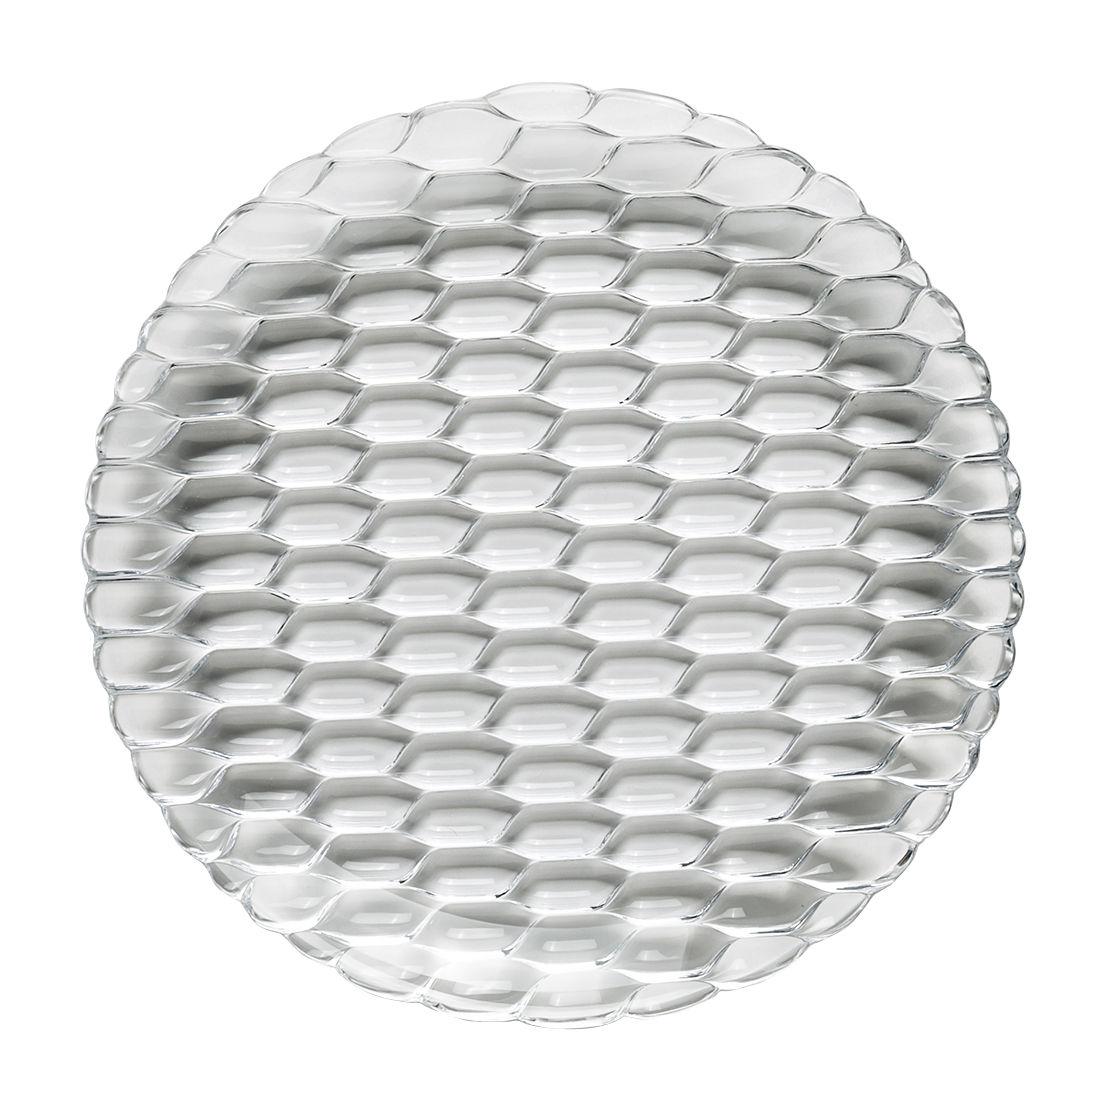 Tischkultur - Teller - Jellies Family Teller / Ø 27 cm - Kartell - Transparent (farblos) - Technopolymère thermoplastique